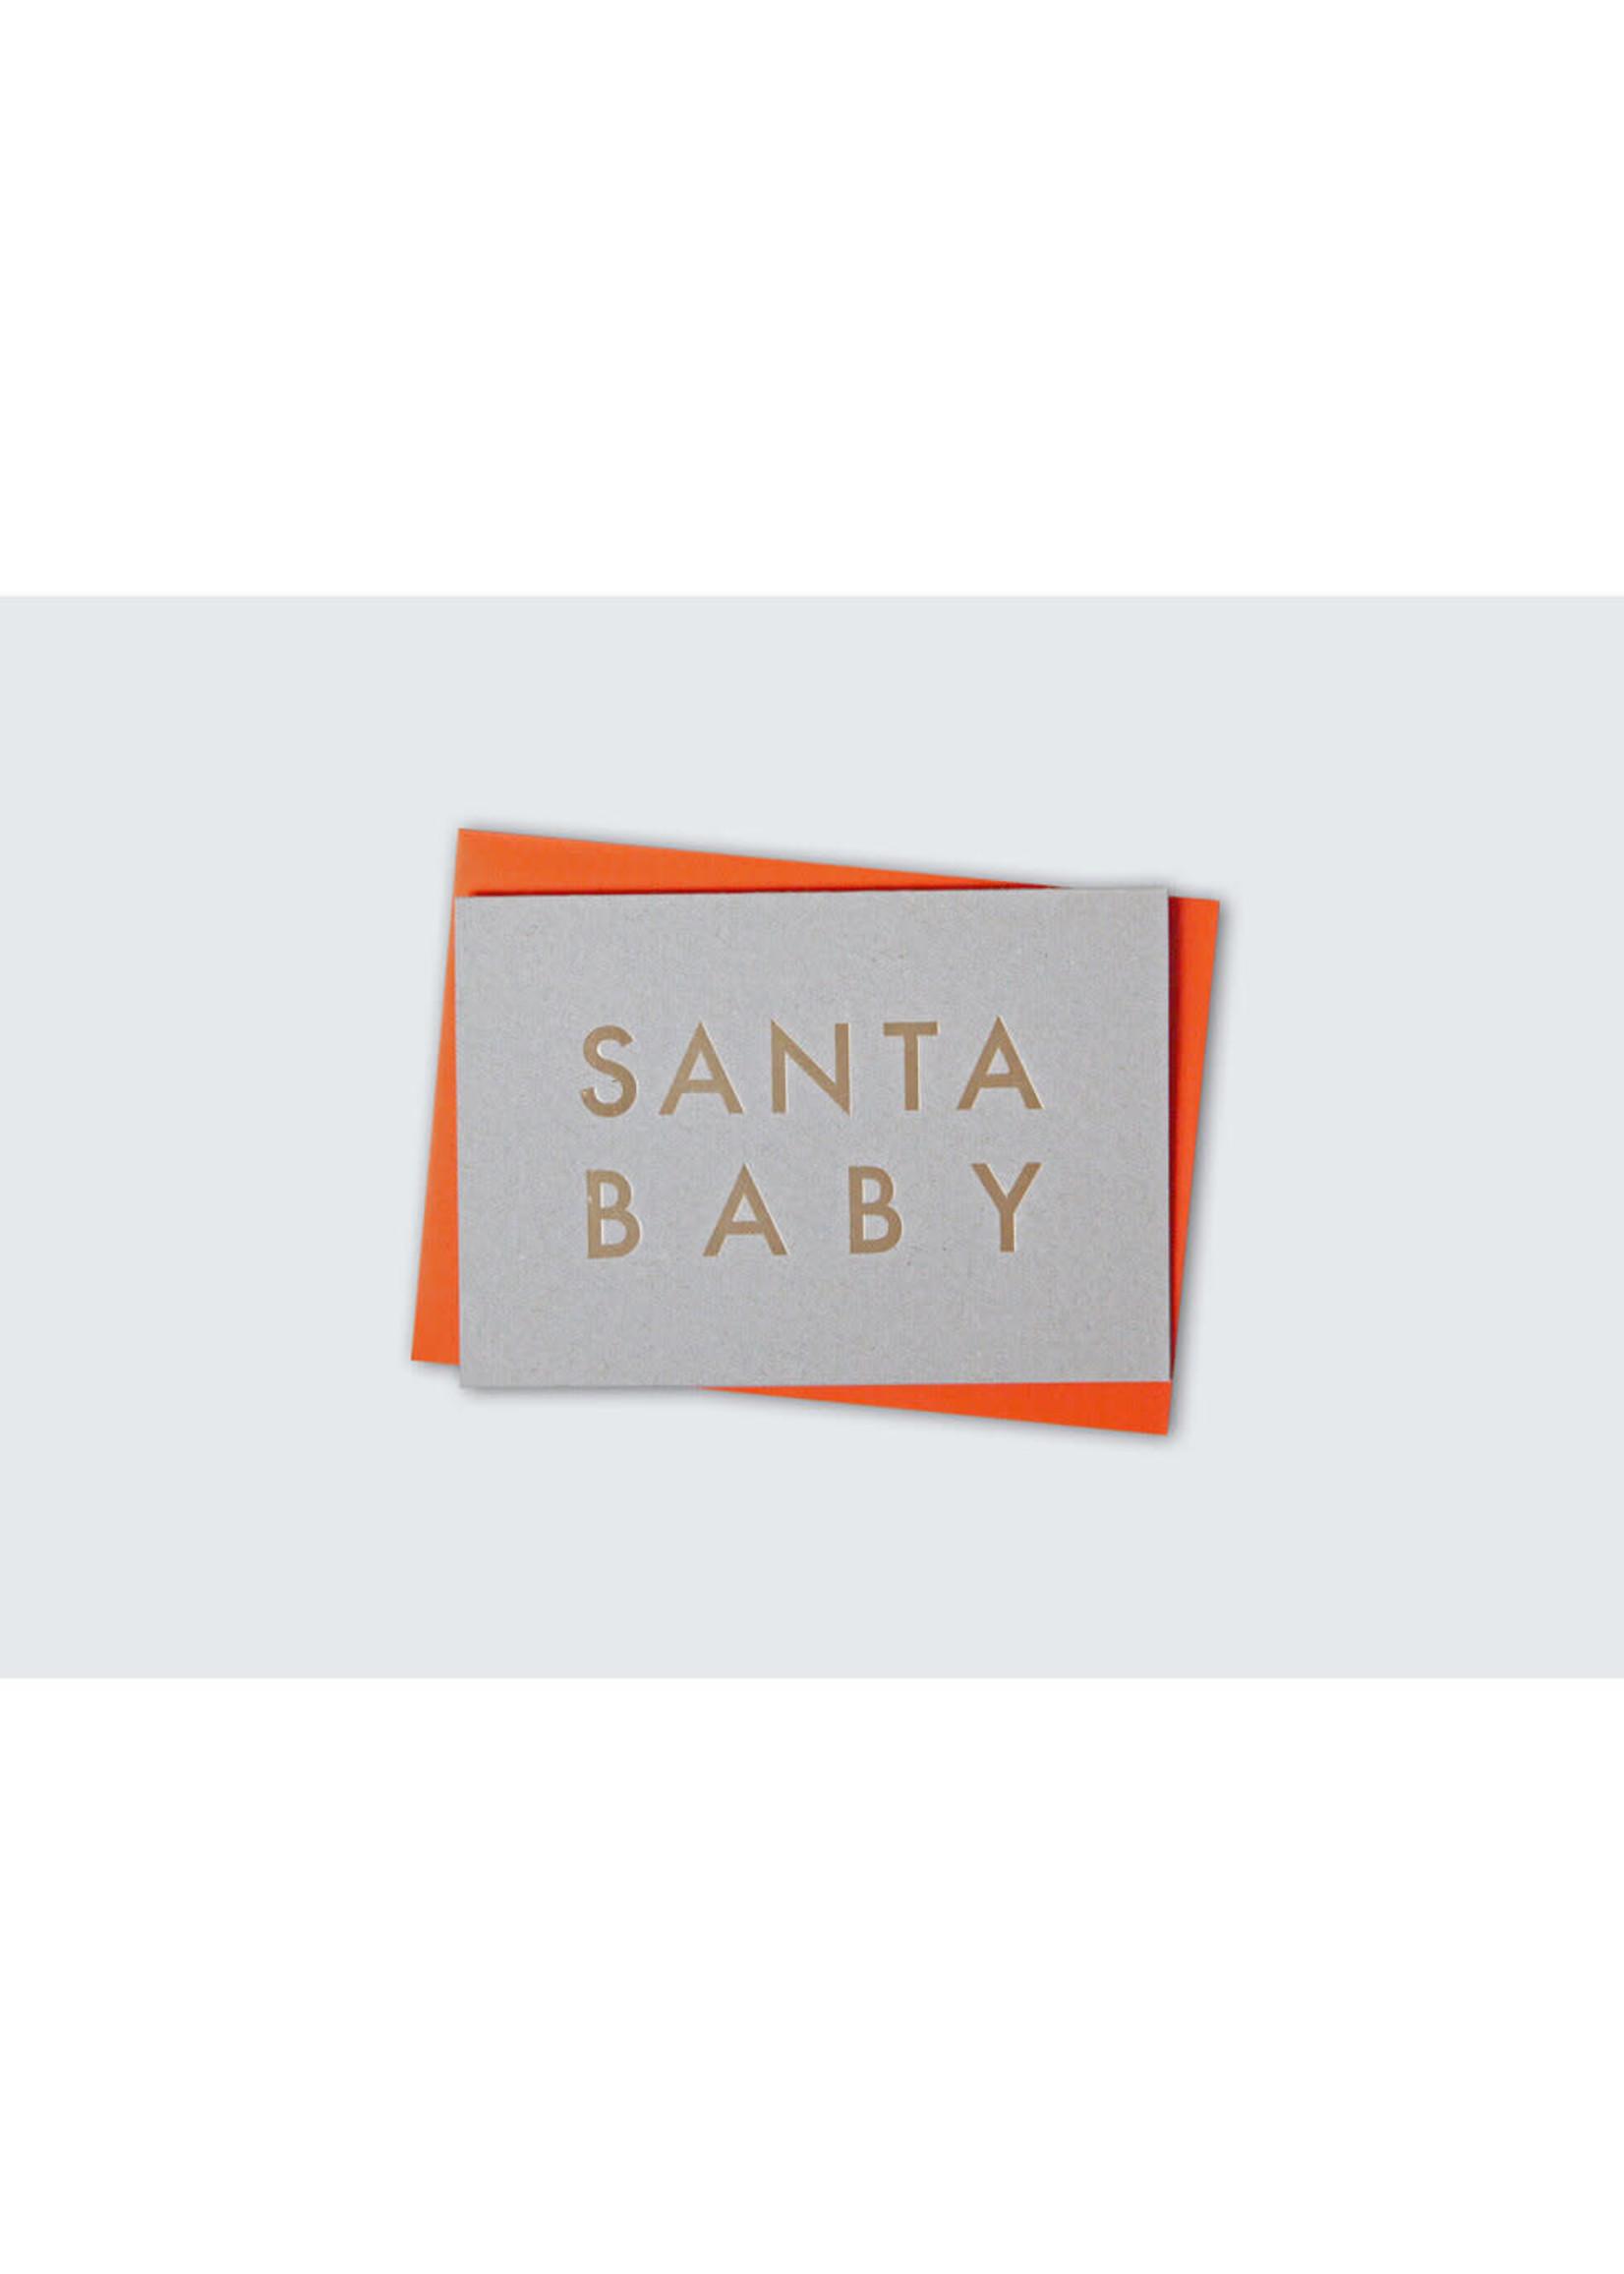 Ola Ola Foil Blocked Cards: SANTA BABY - Grey